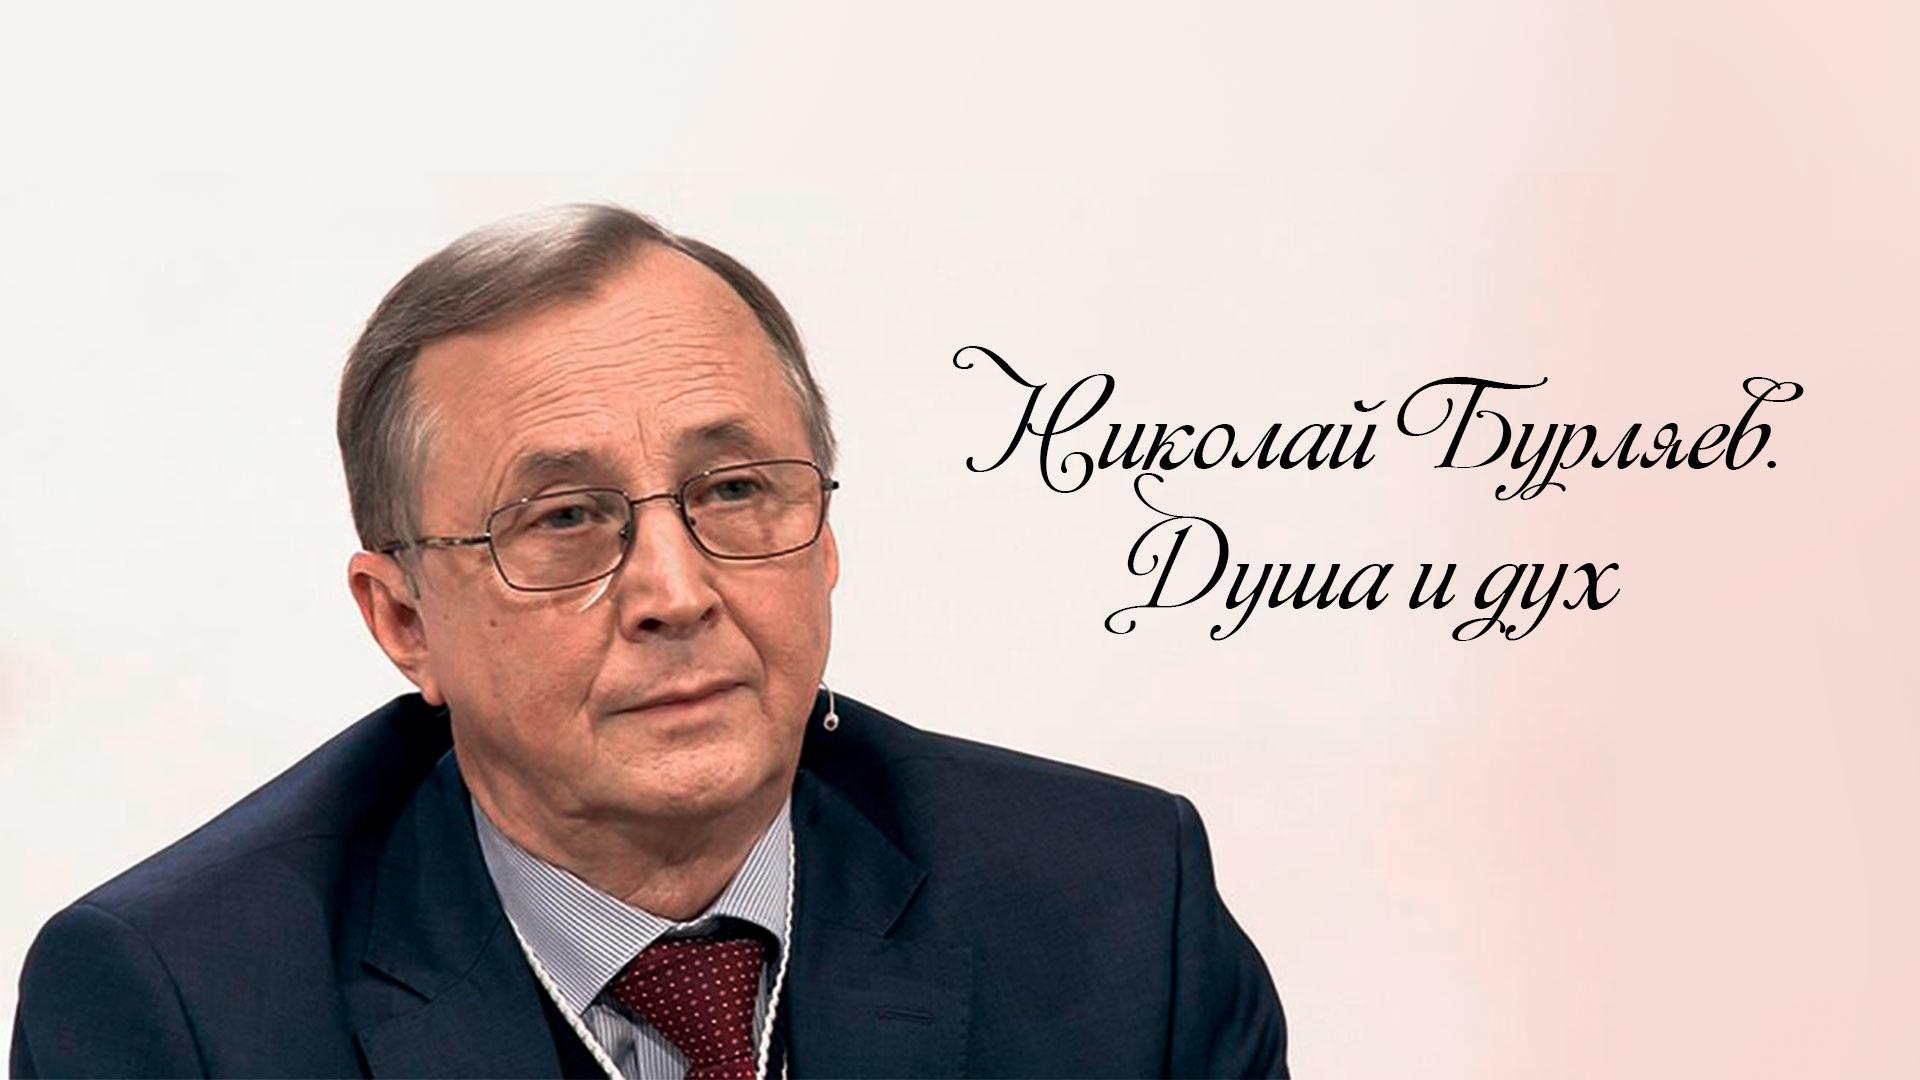 Николай Бурляев. Душа и дух